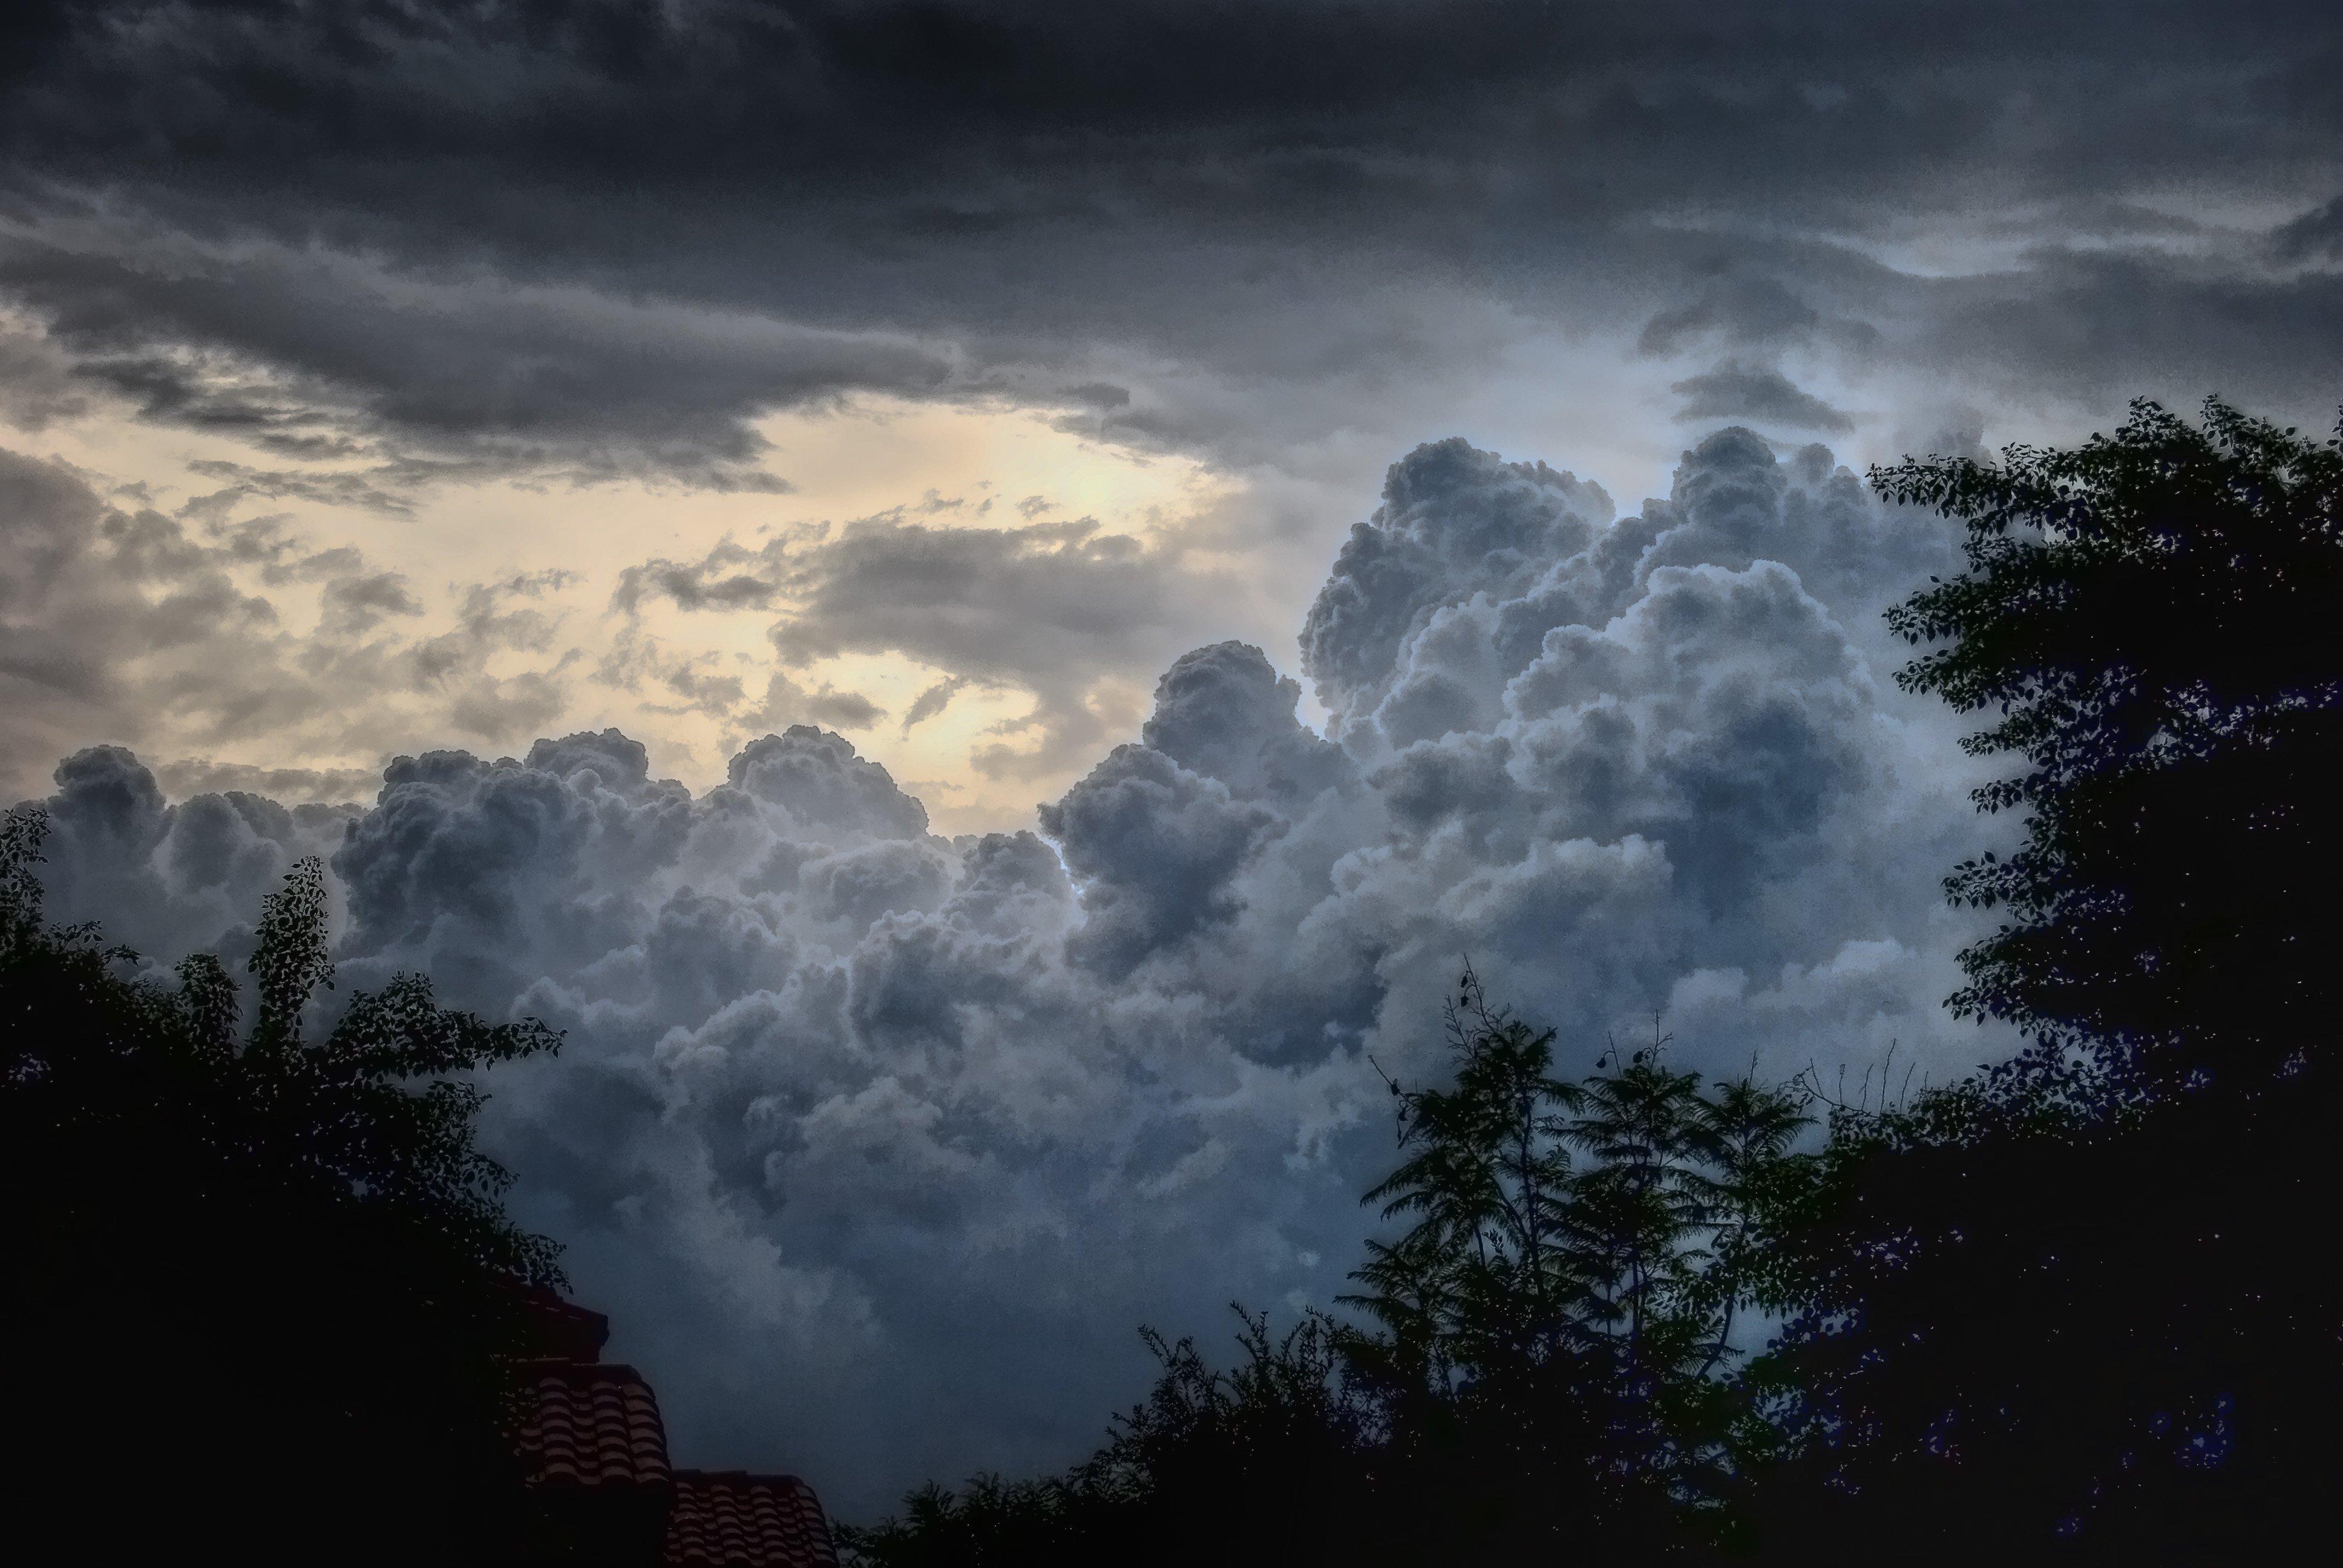 Download Wallpaper Mountain Rain - 47dc0d60e4fa7b219b248865dec95d53  Photograph_83758.jpg